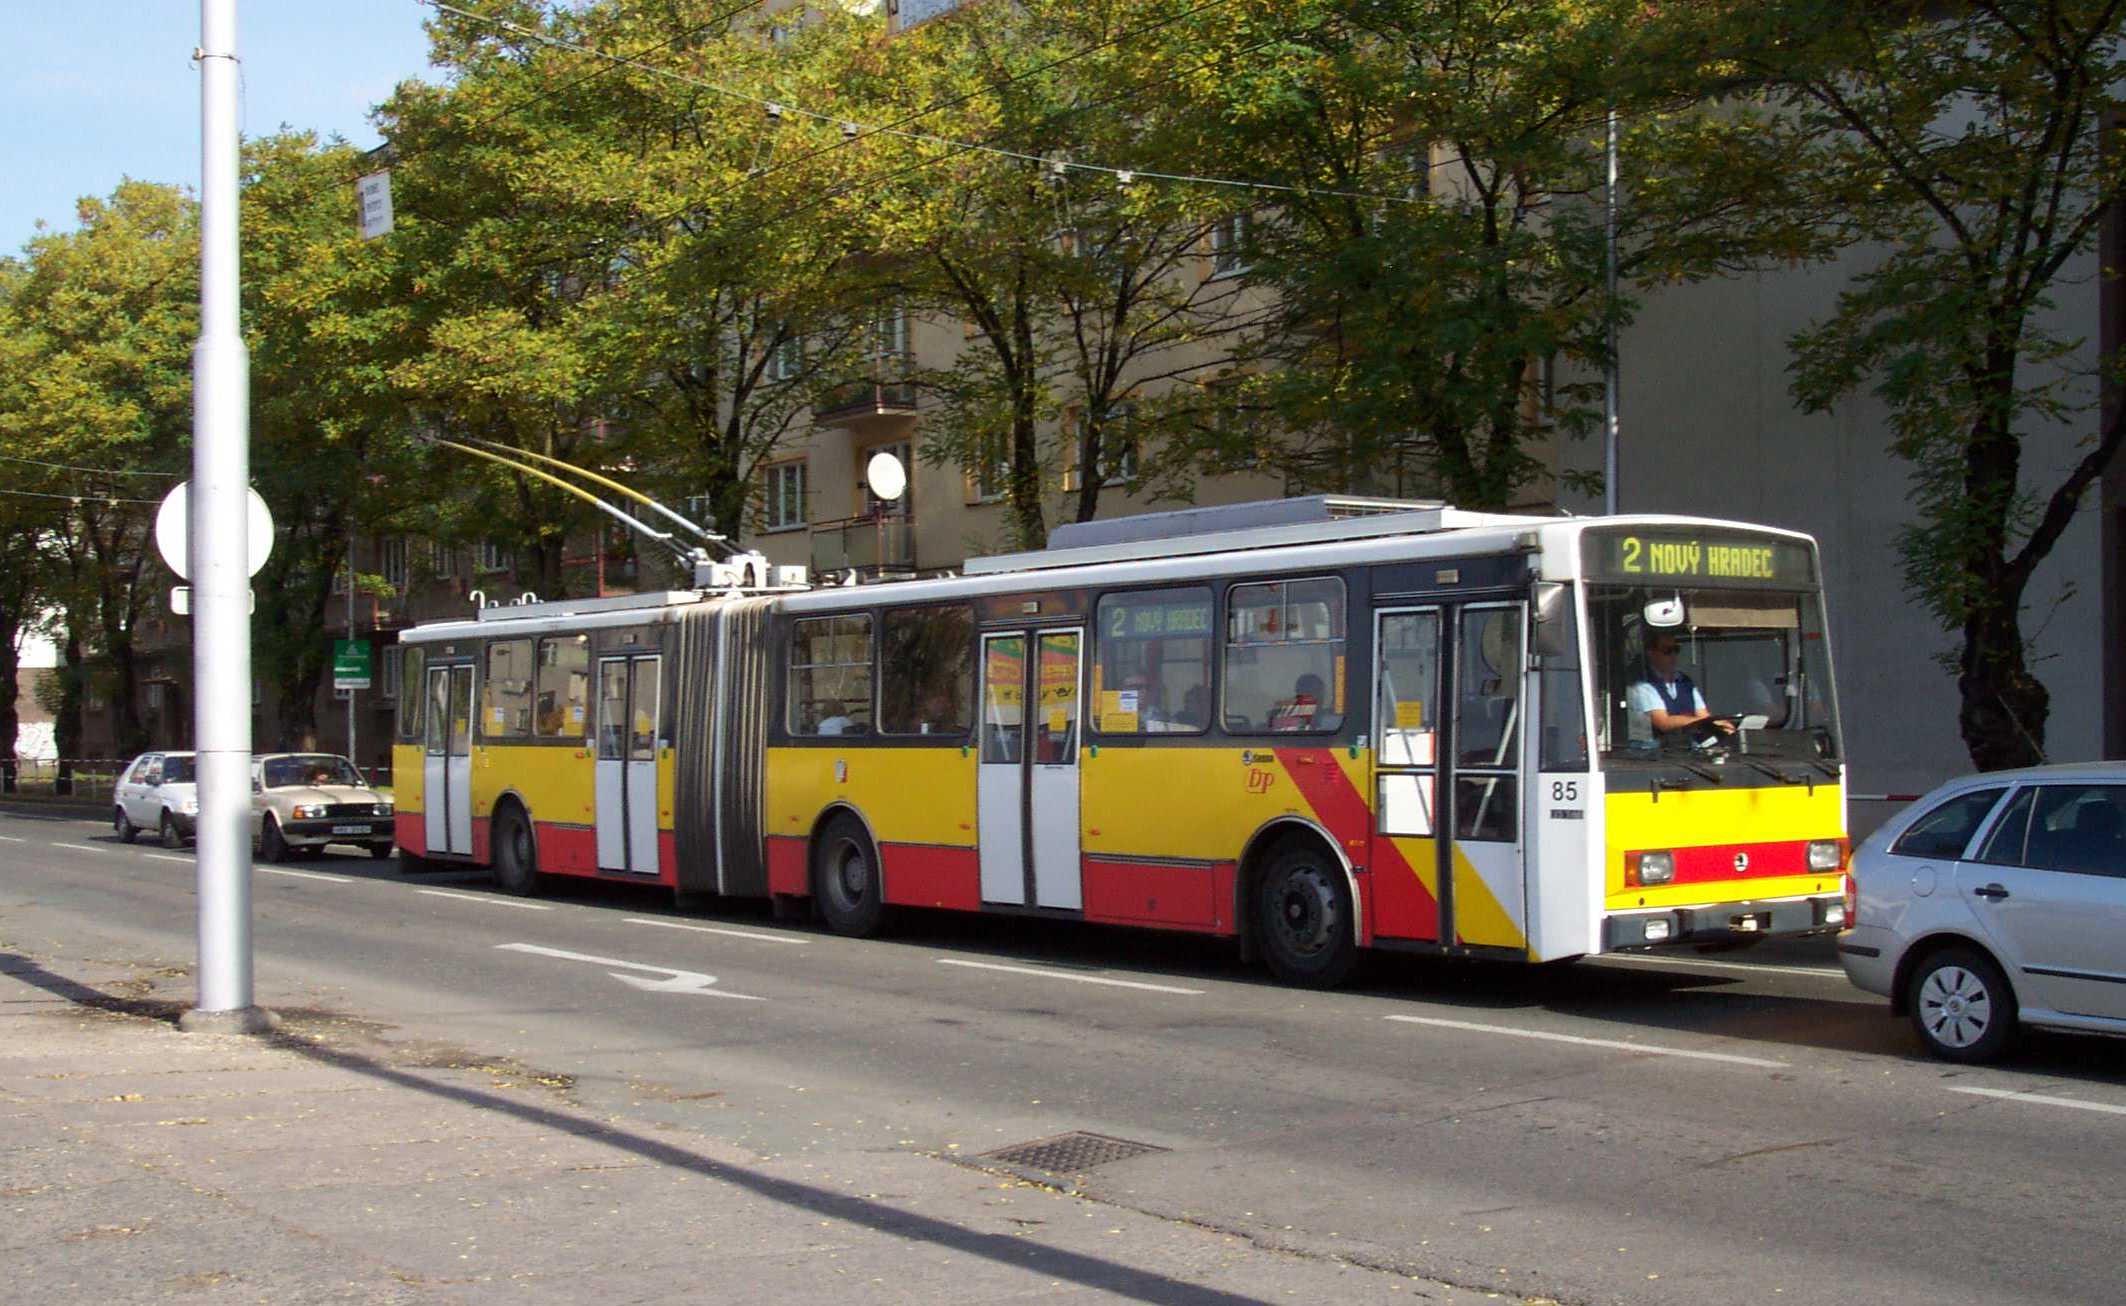 троллейбусов skoda 14trm и skoda 15trm